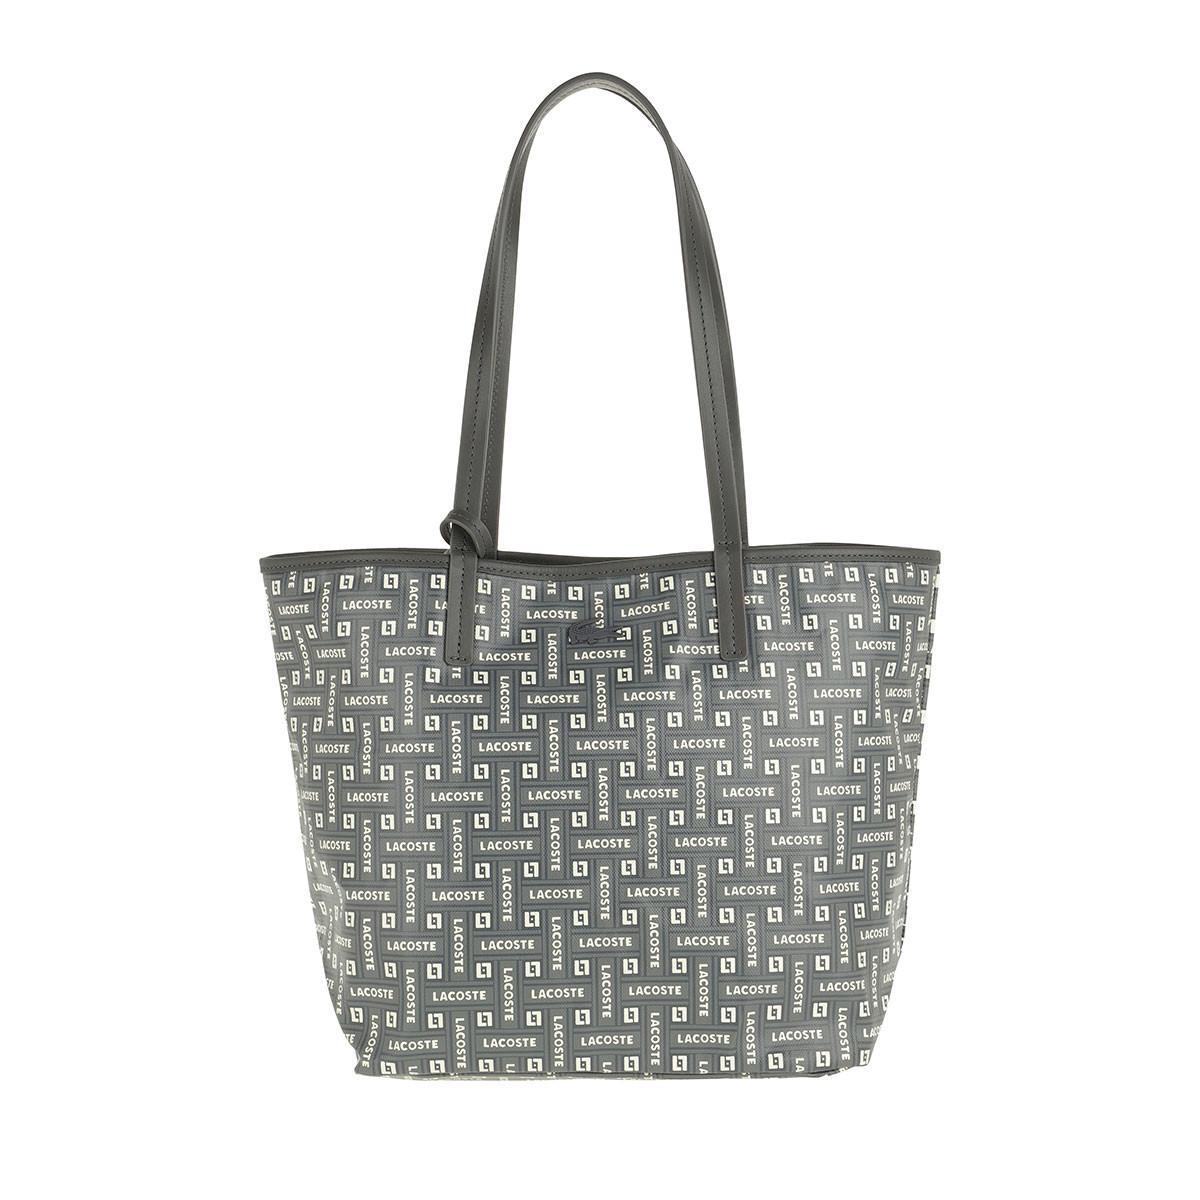 b1d7f52b3fd2c Lacoste - S Shopping Bag Blue - Lyst. View fullscreen